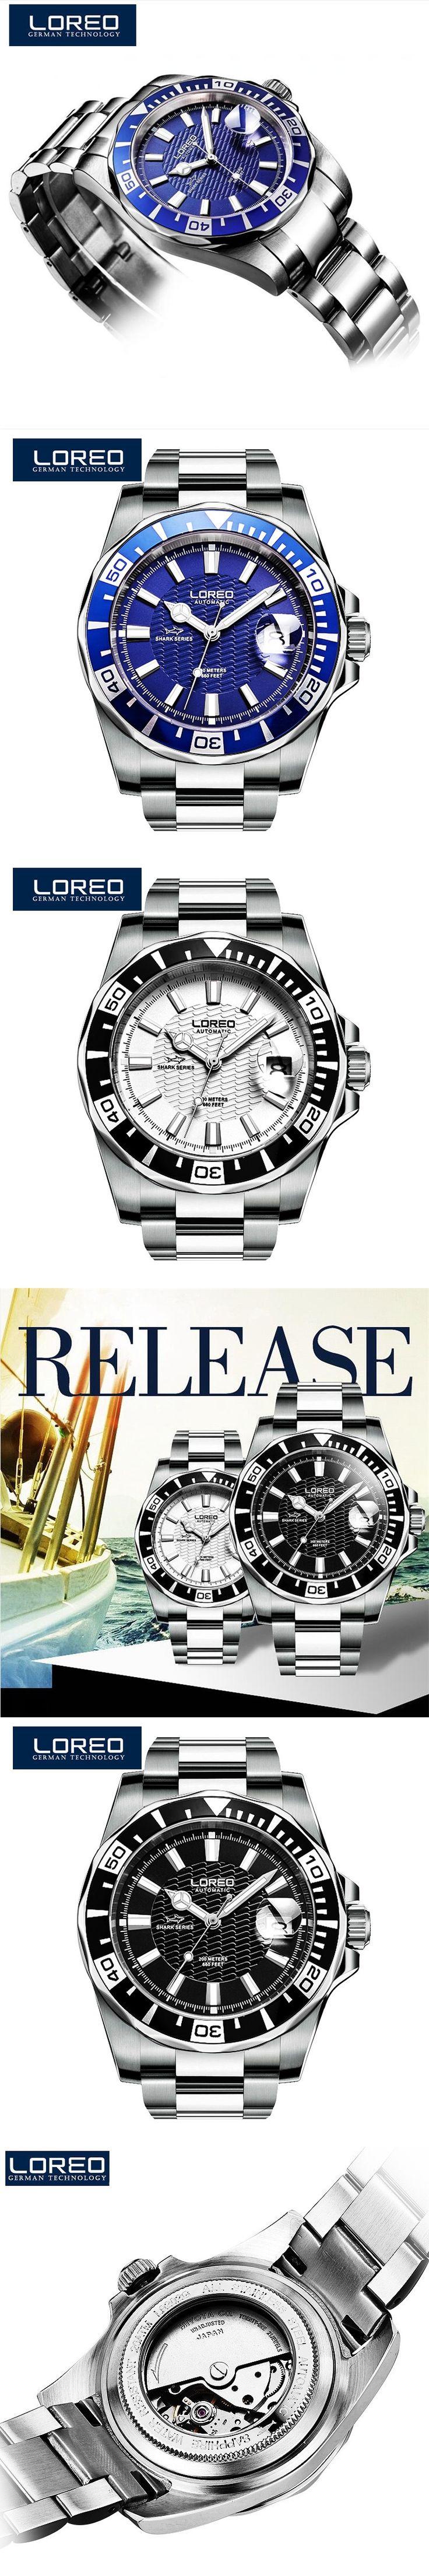 LOREO Automatic Mechanical Movements Watch Men Stainless Steel 200m Waterproof Diver Relogio Feminine Luminous Watch K33